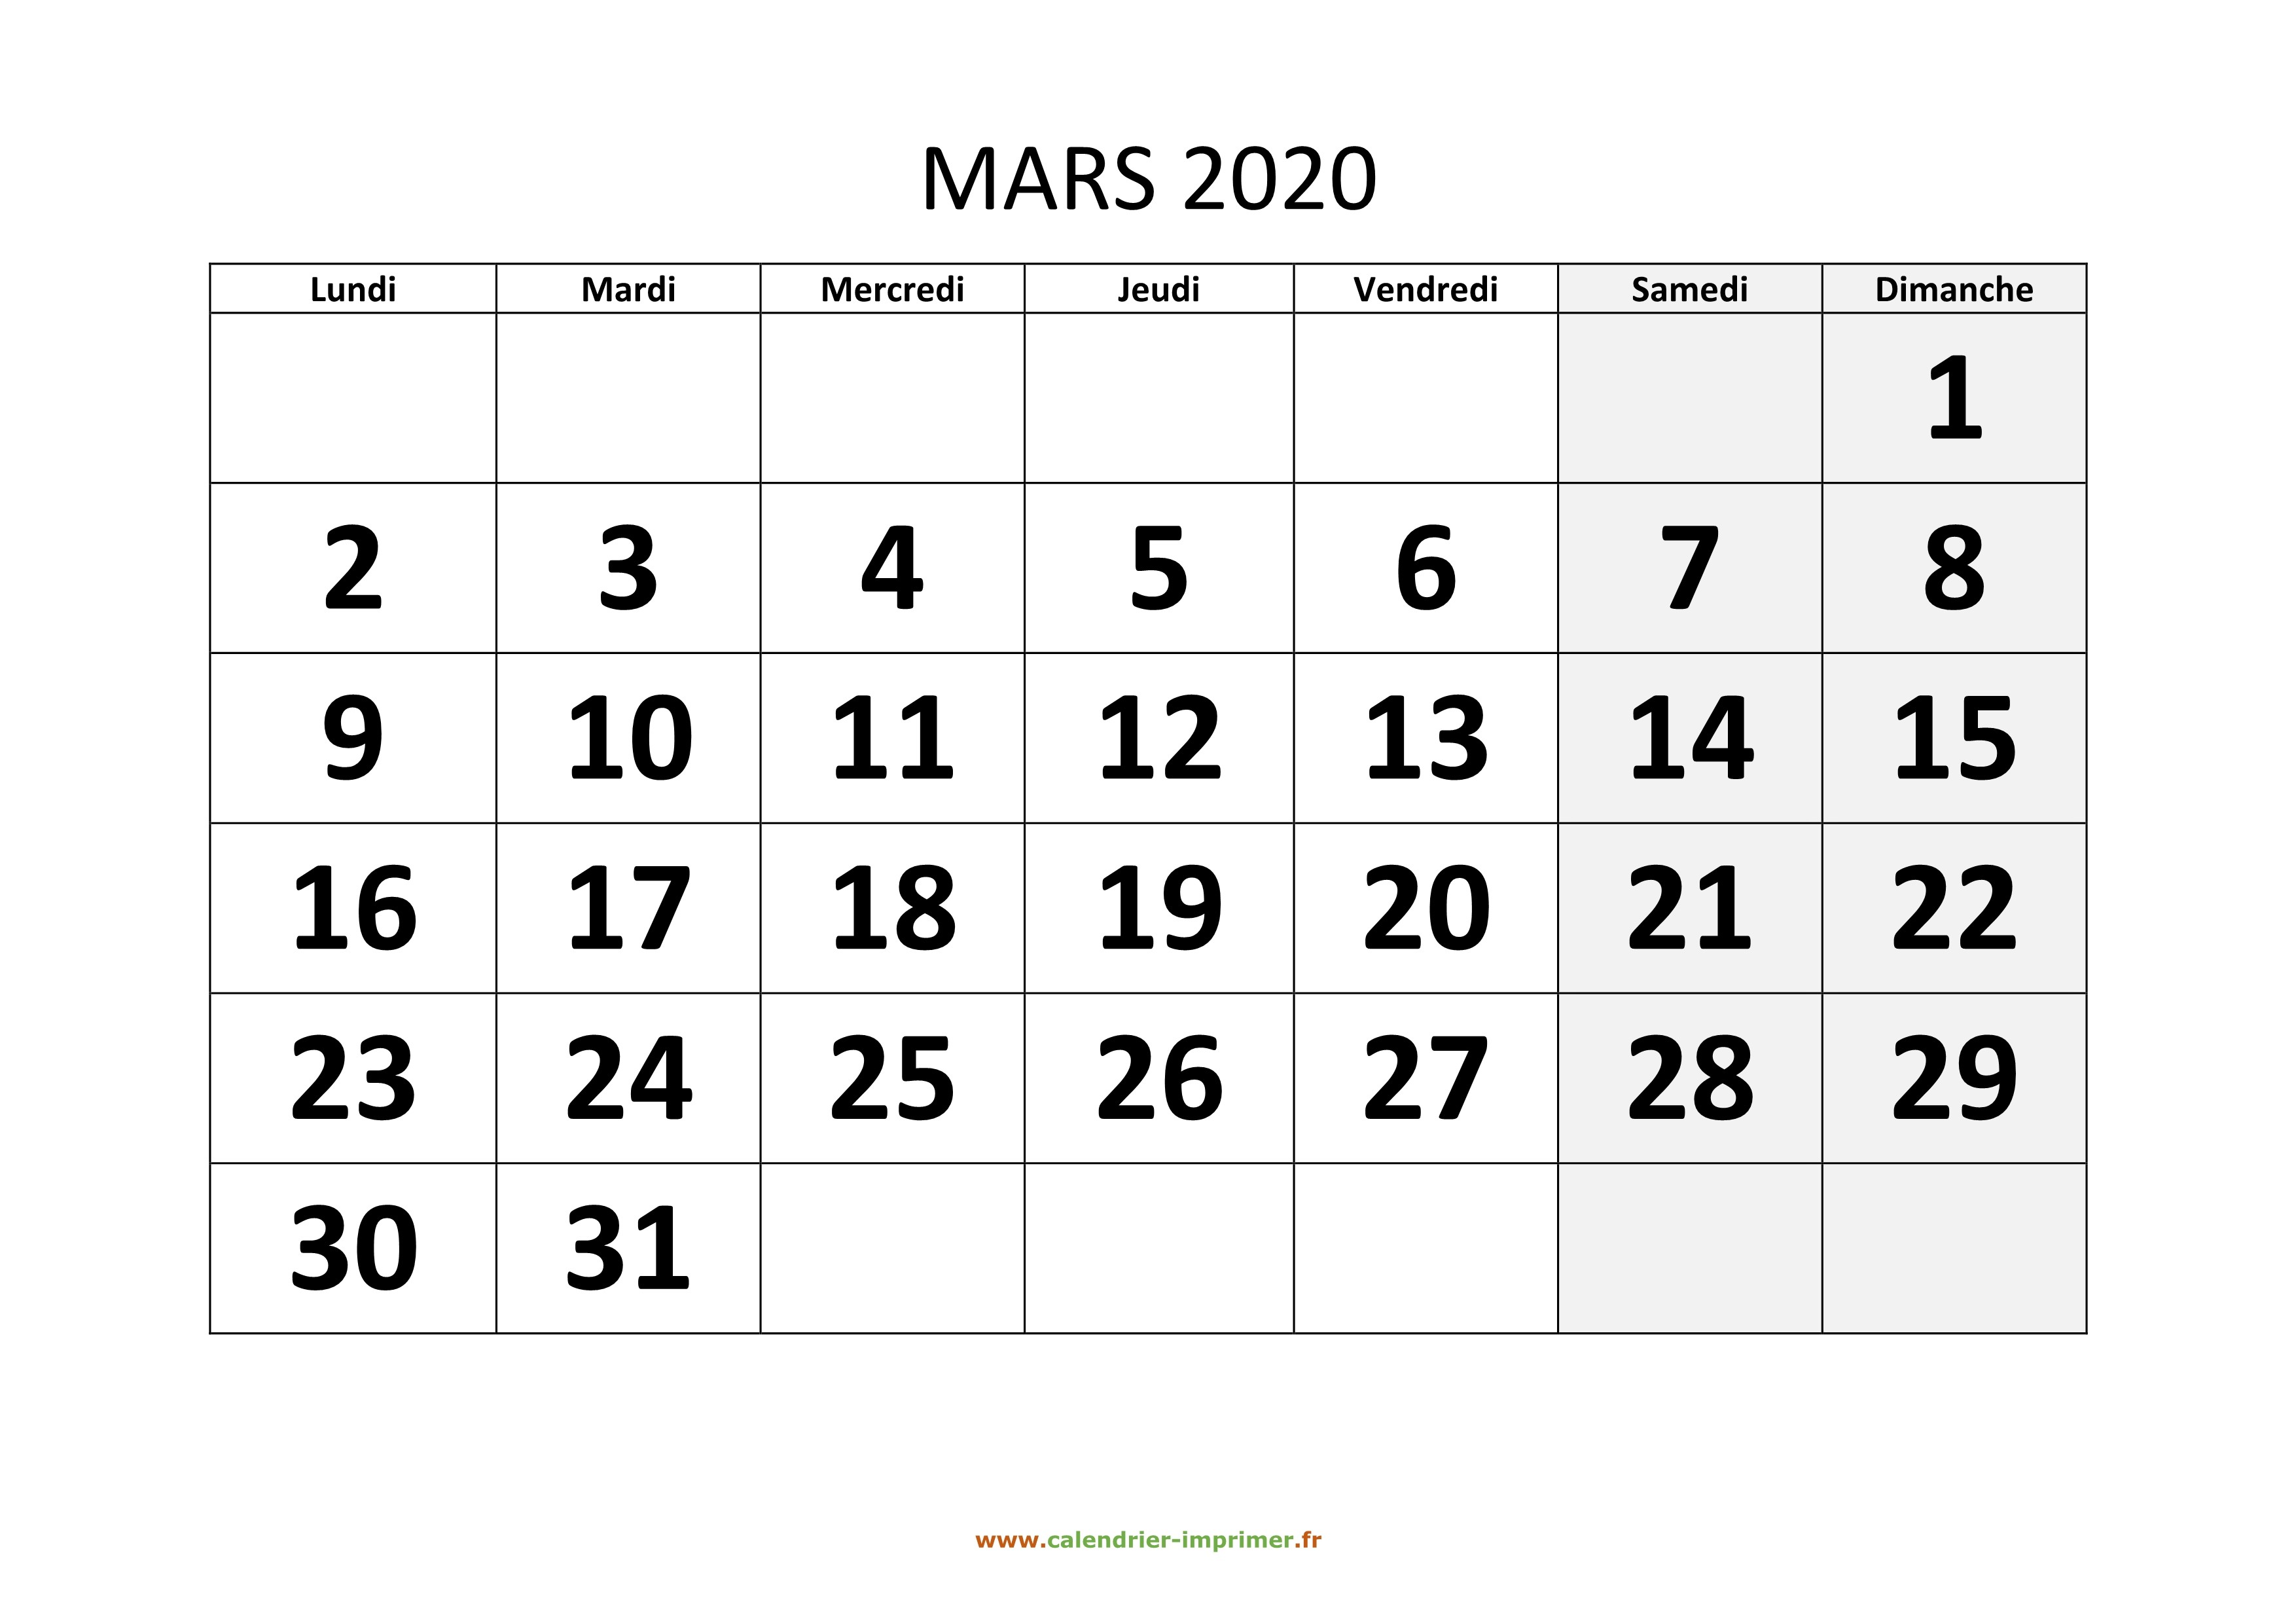 Calendrier Hiver 2019-2020 - Mars 2020